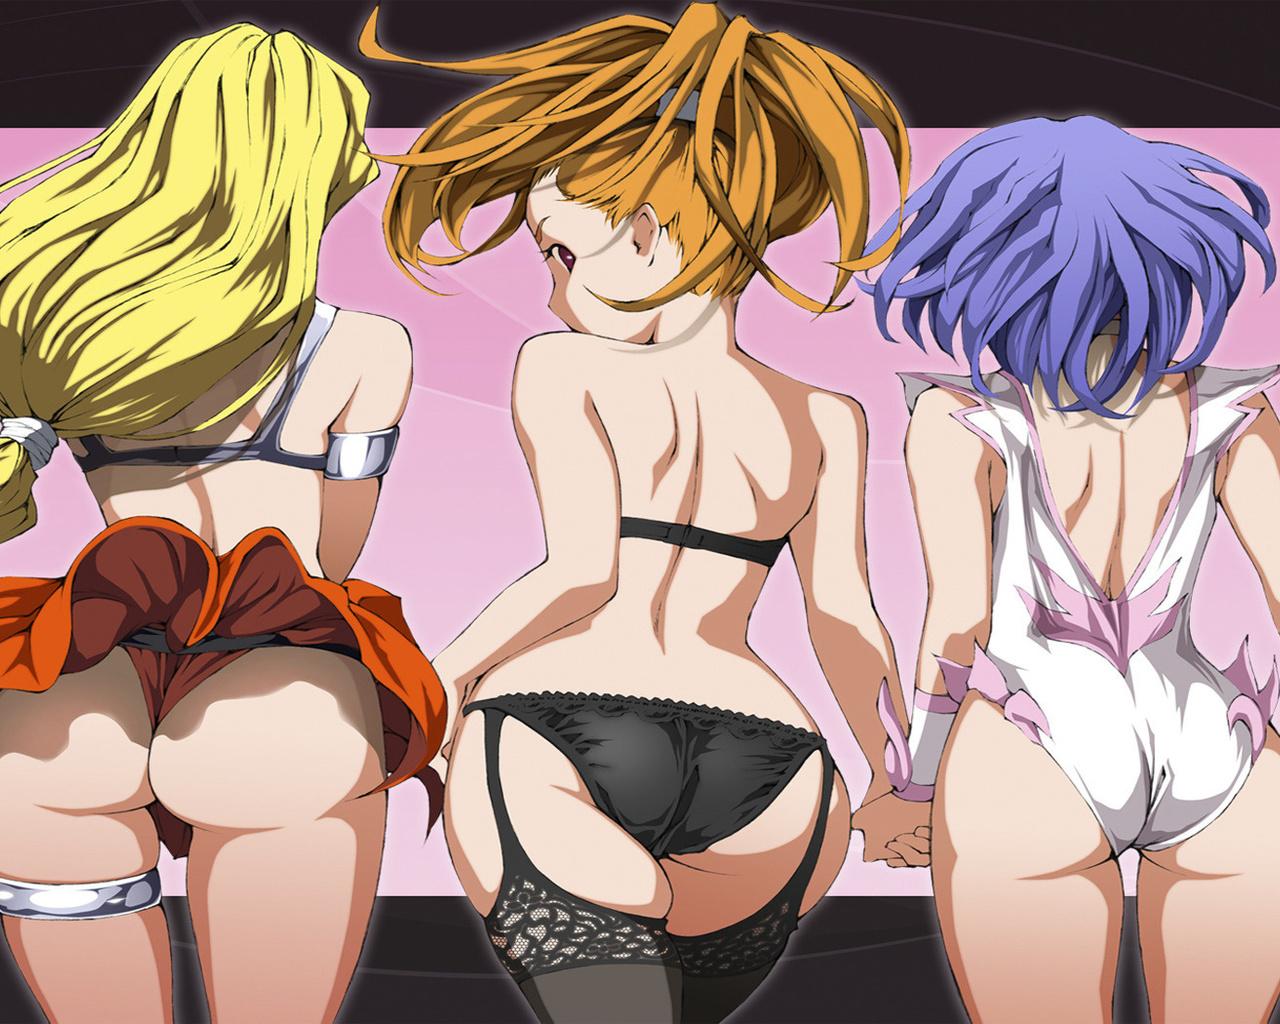 эро картинки аниме девушки: